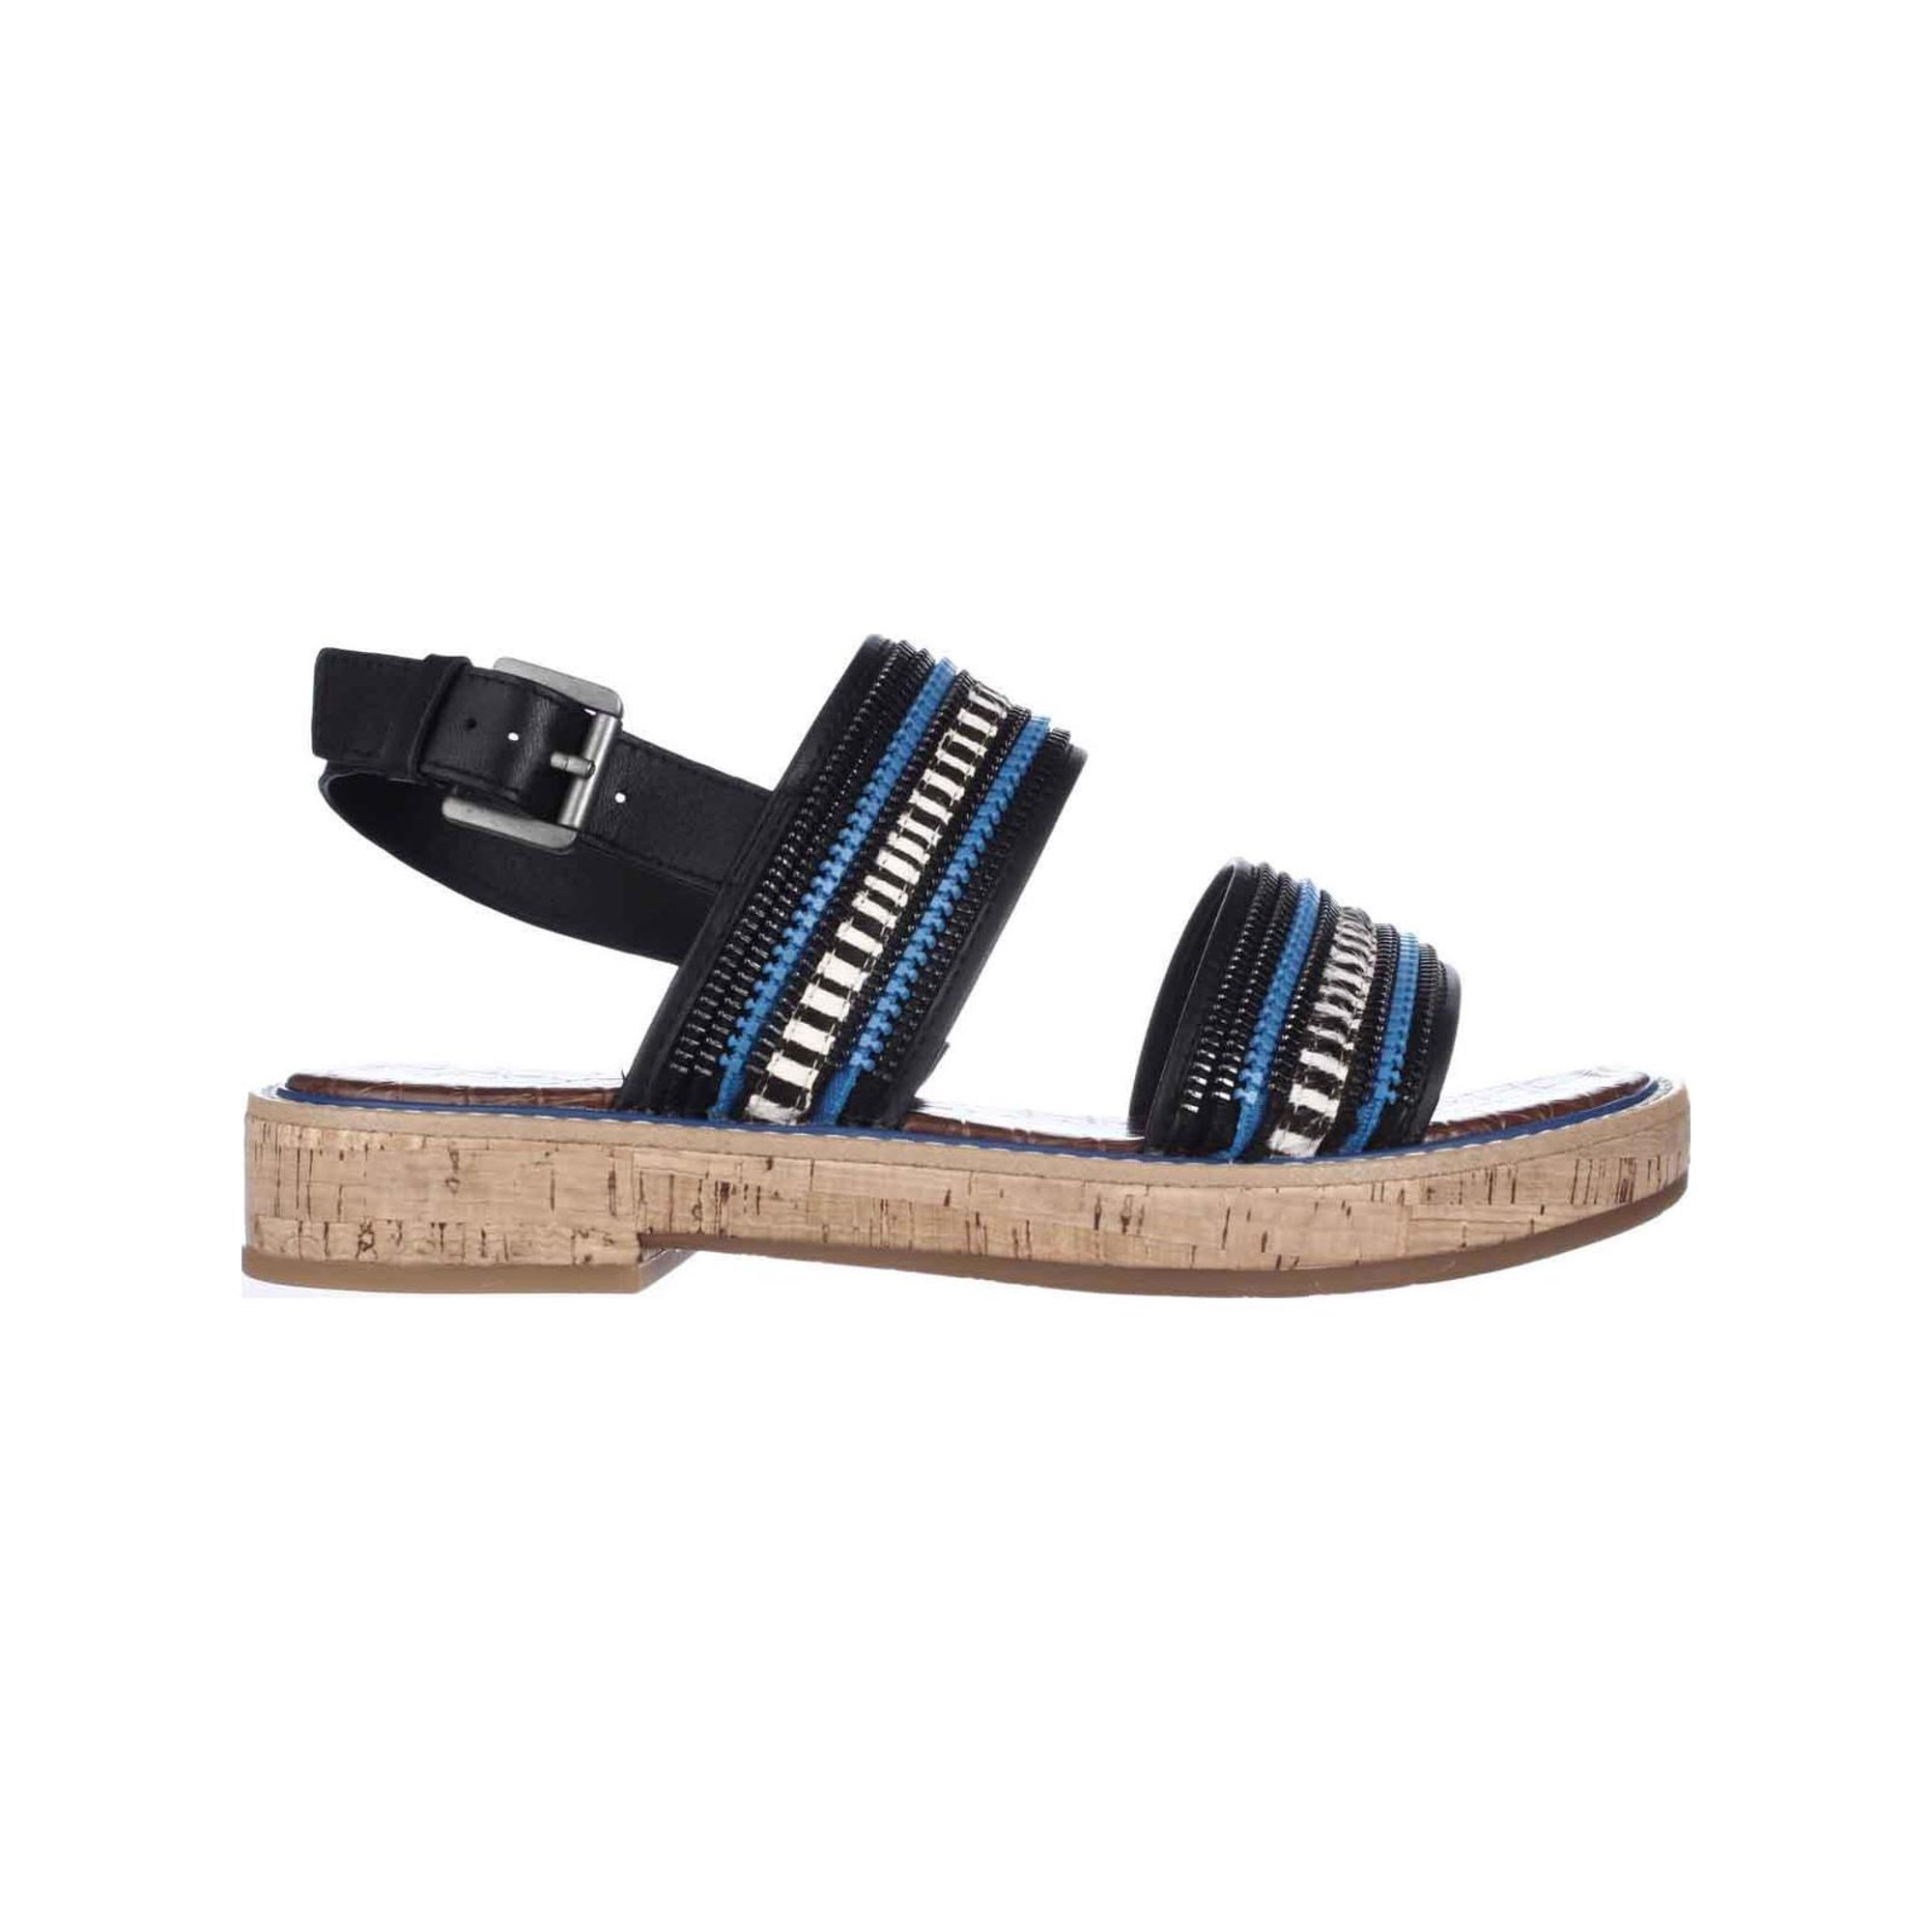 b3605c97716d72 Sam Edelman Nala Flat Sling-Back Sandals